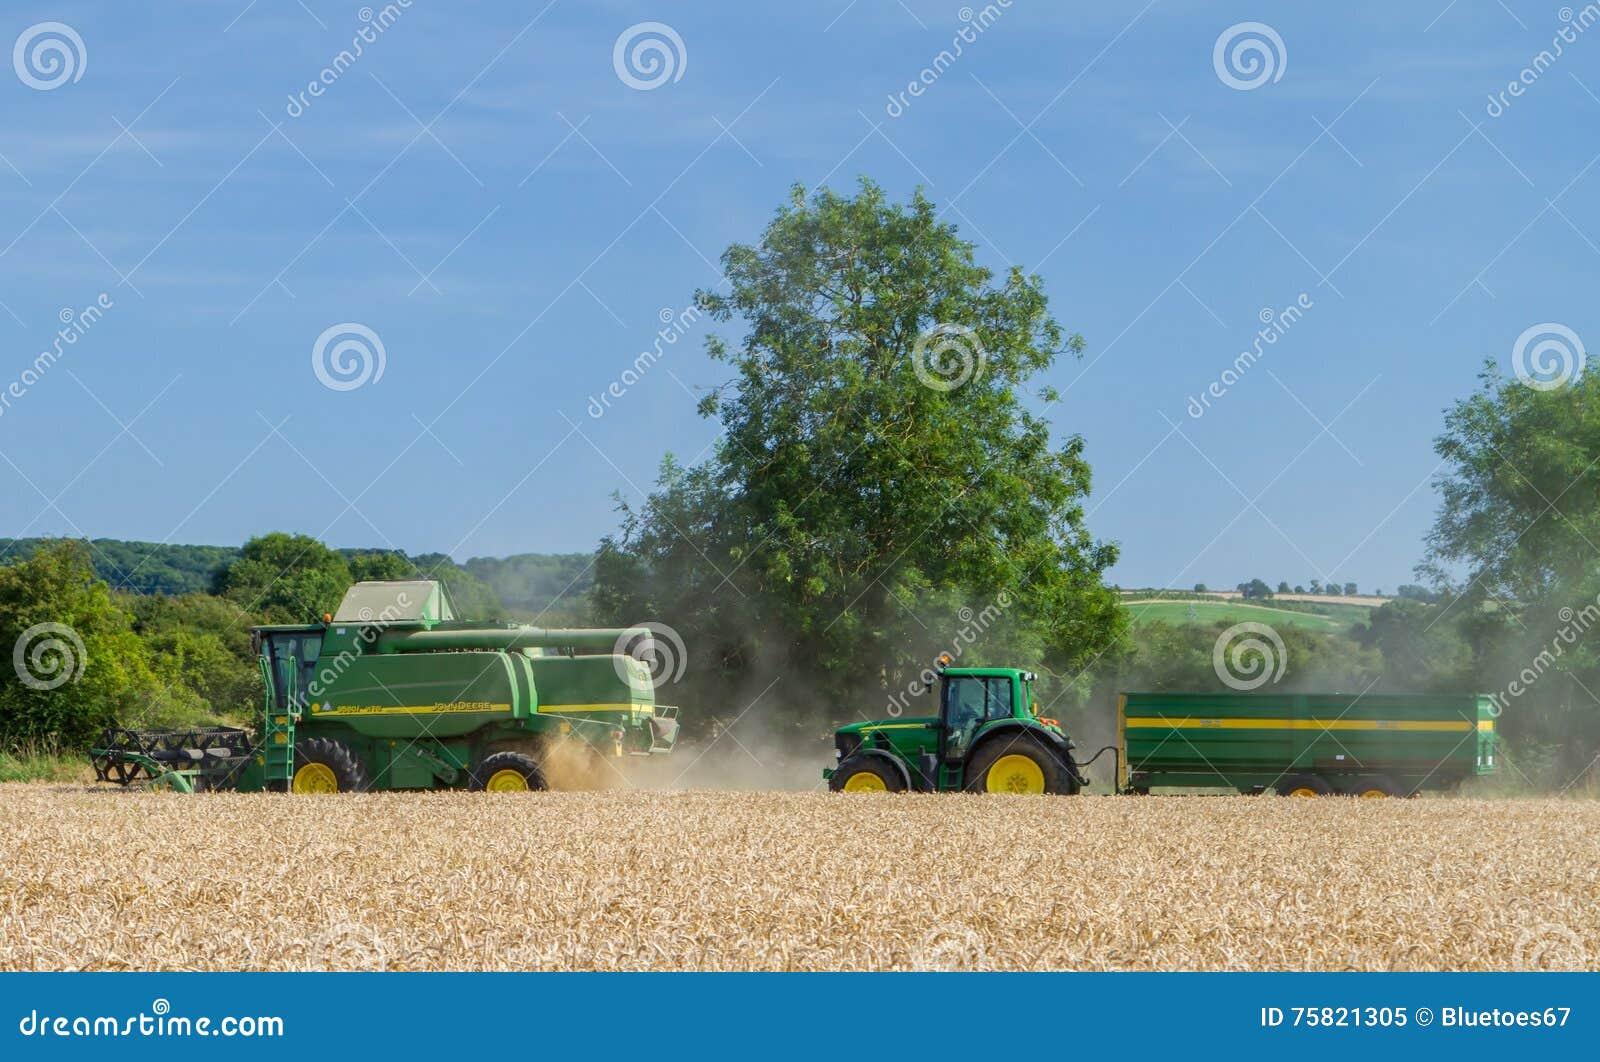 Cartoon Tractor Corn Picker : Modern john deere combine harvester cutting crops with